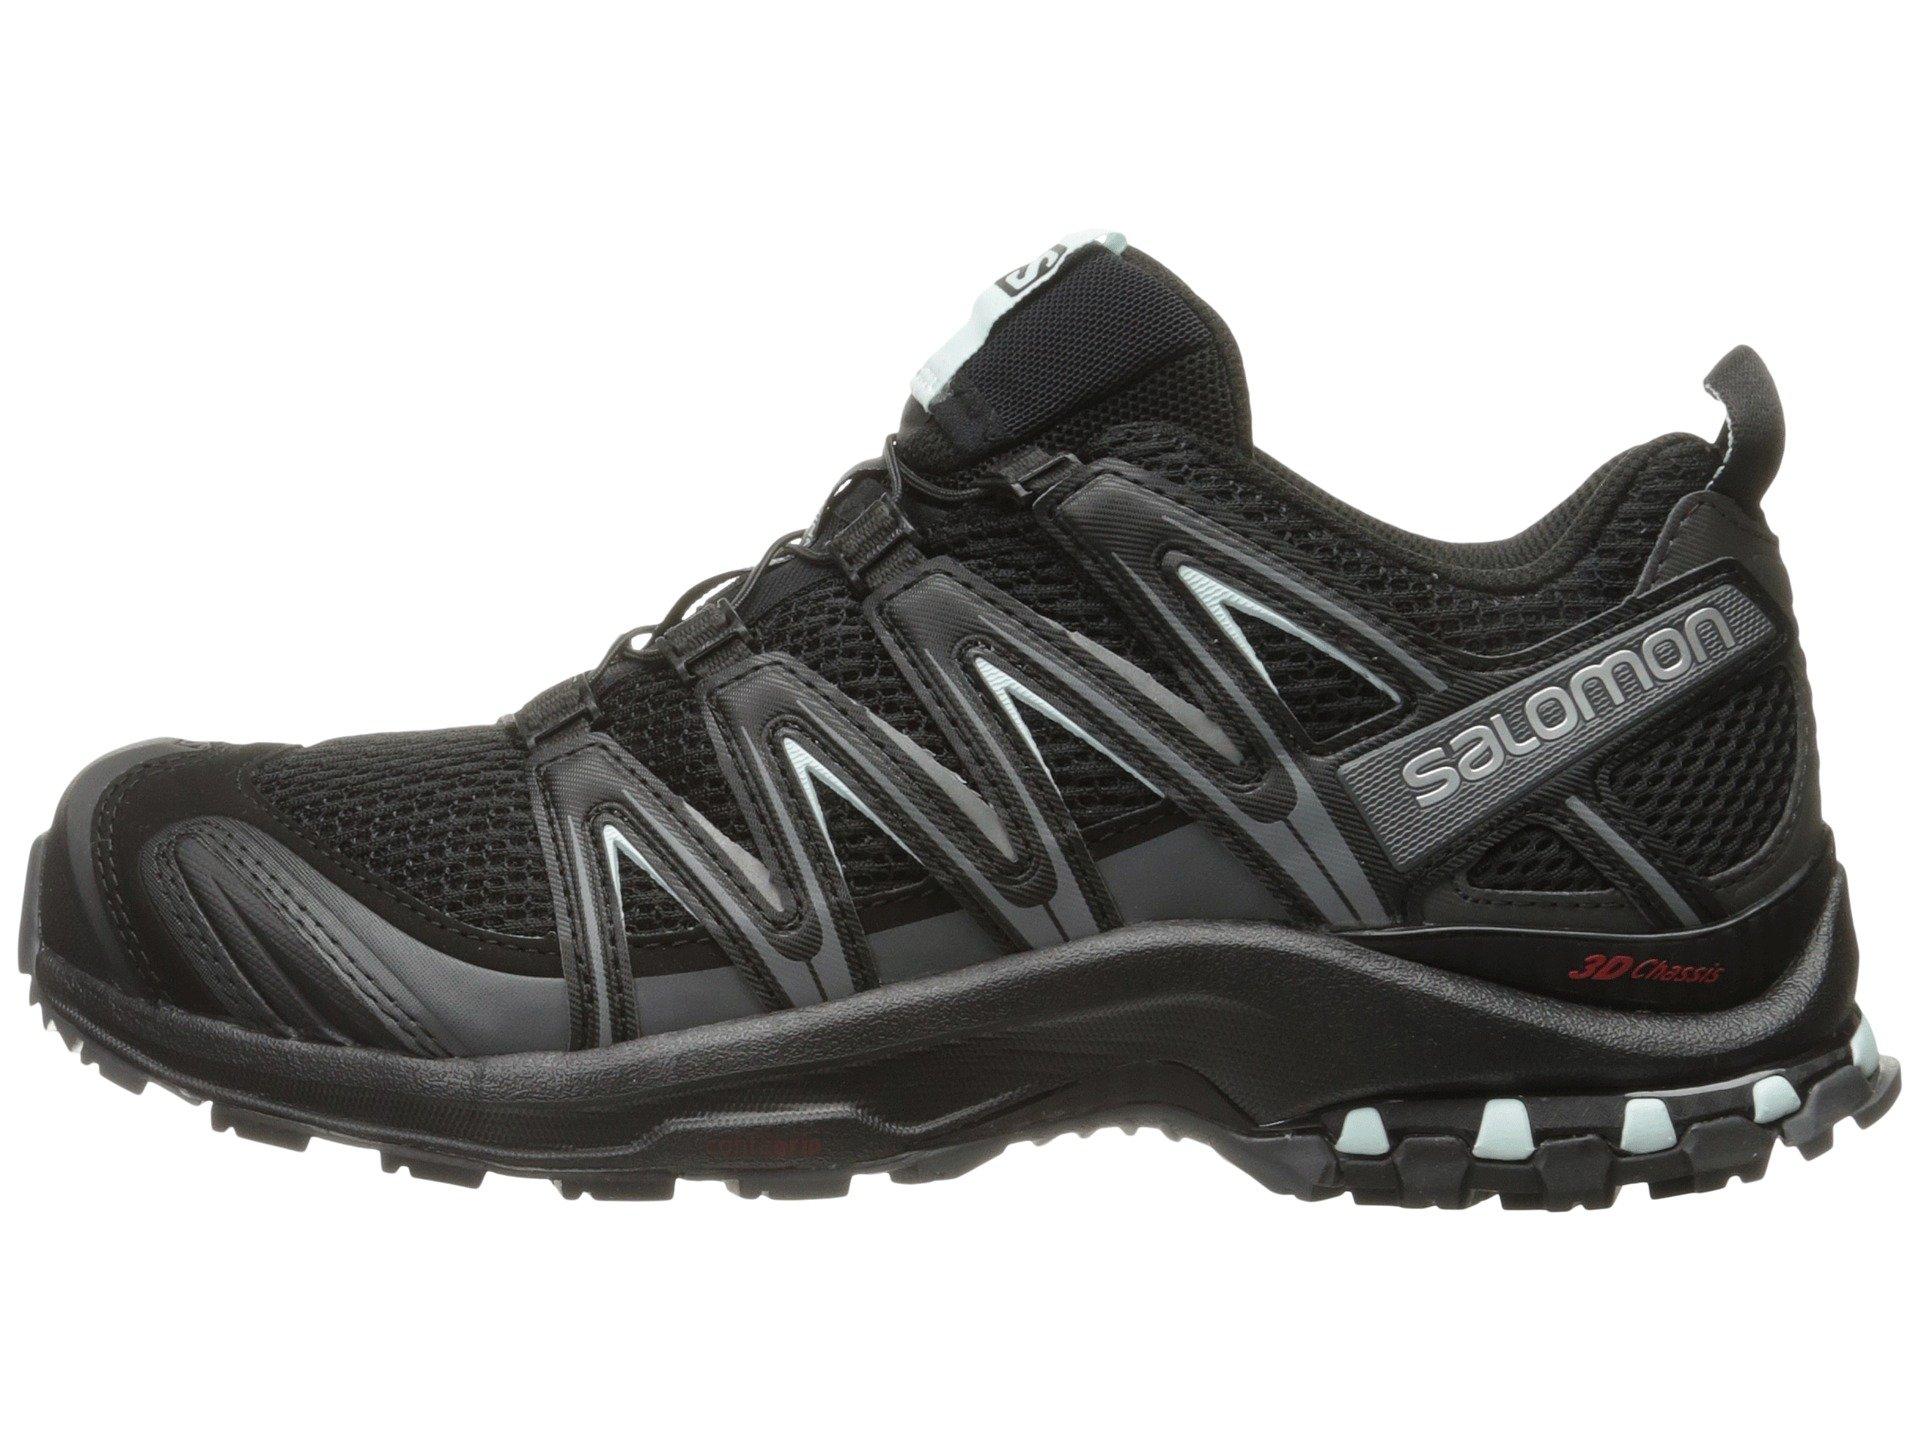 2019 8 Best From Salomon Running Shoes rdCsQth